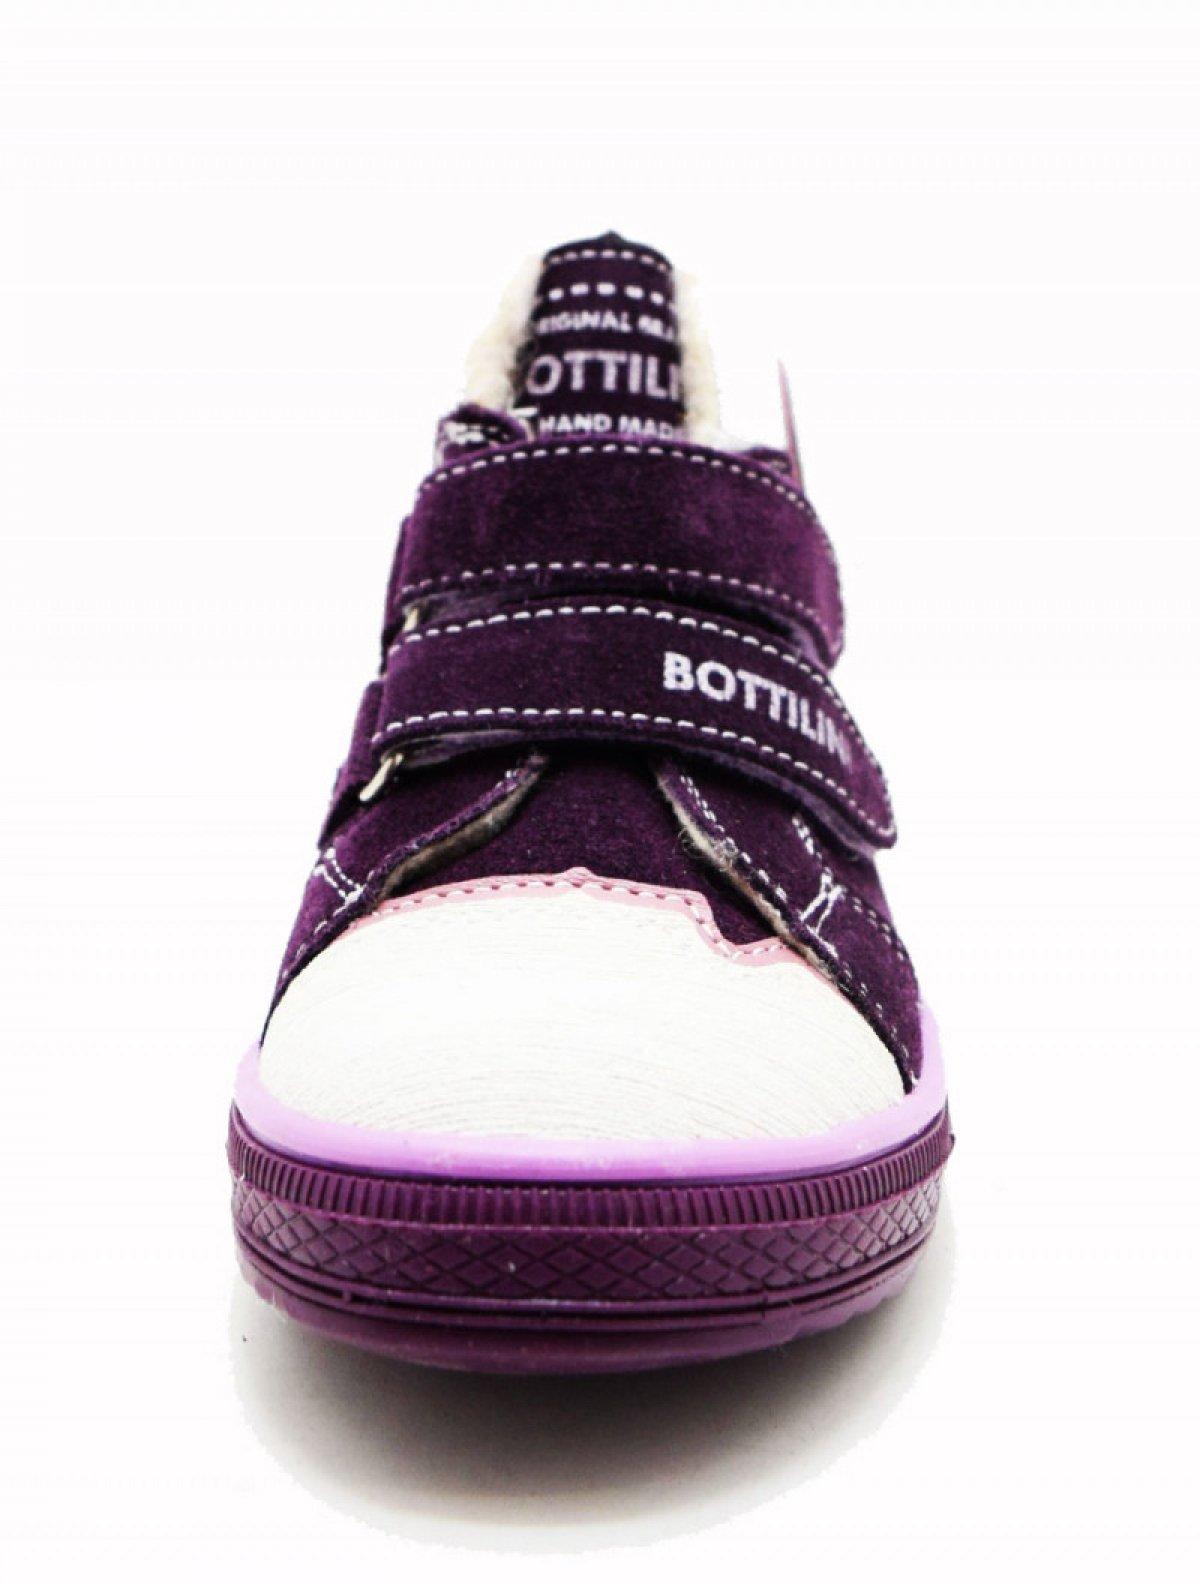 Bottilini BL-115(9) ботинки для девочки